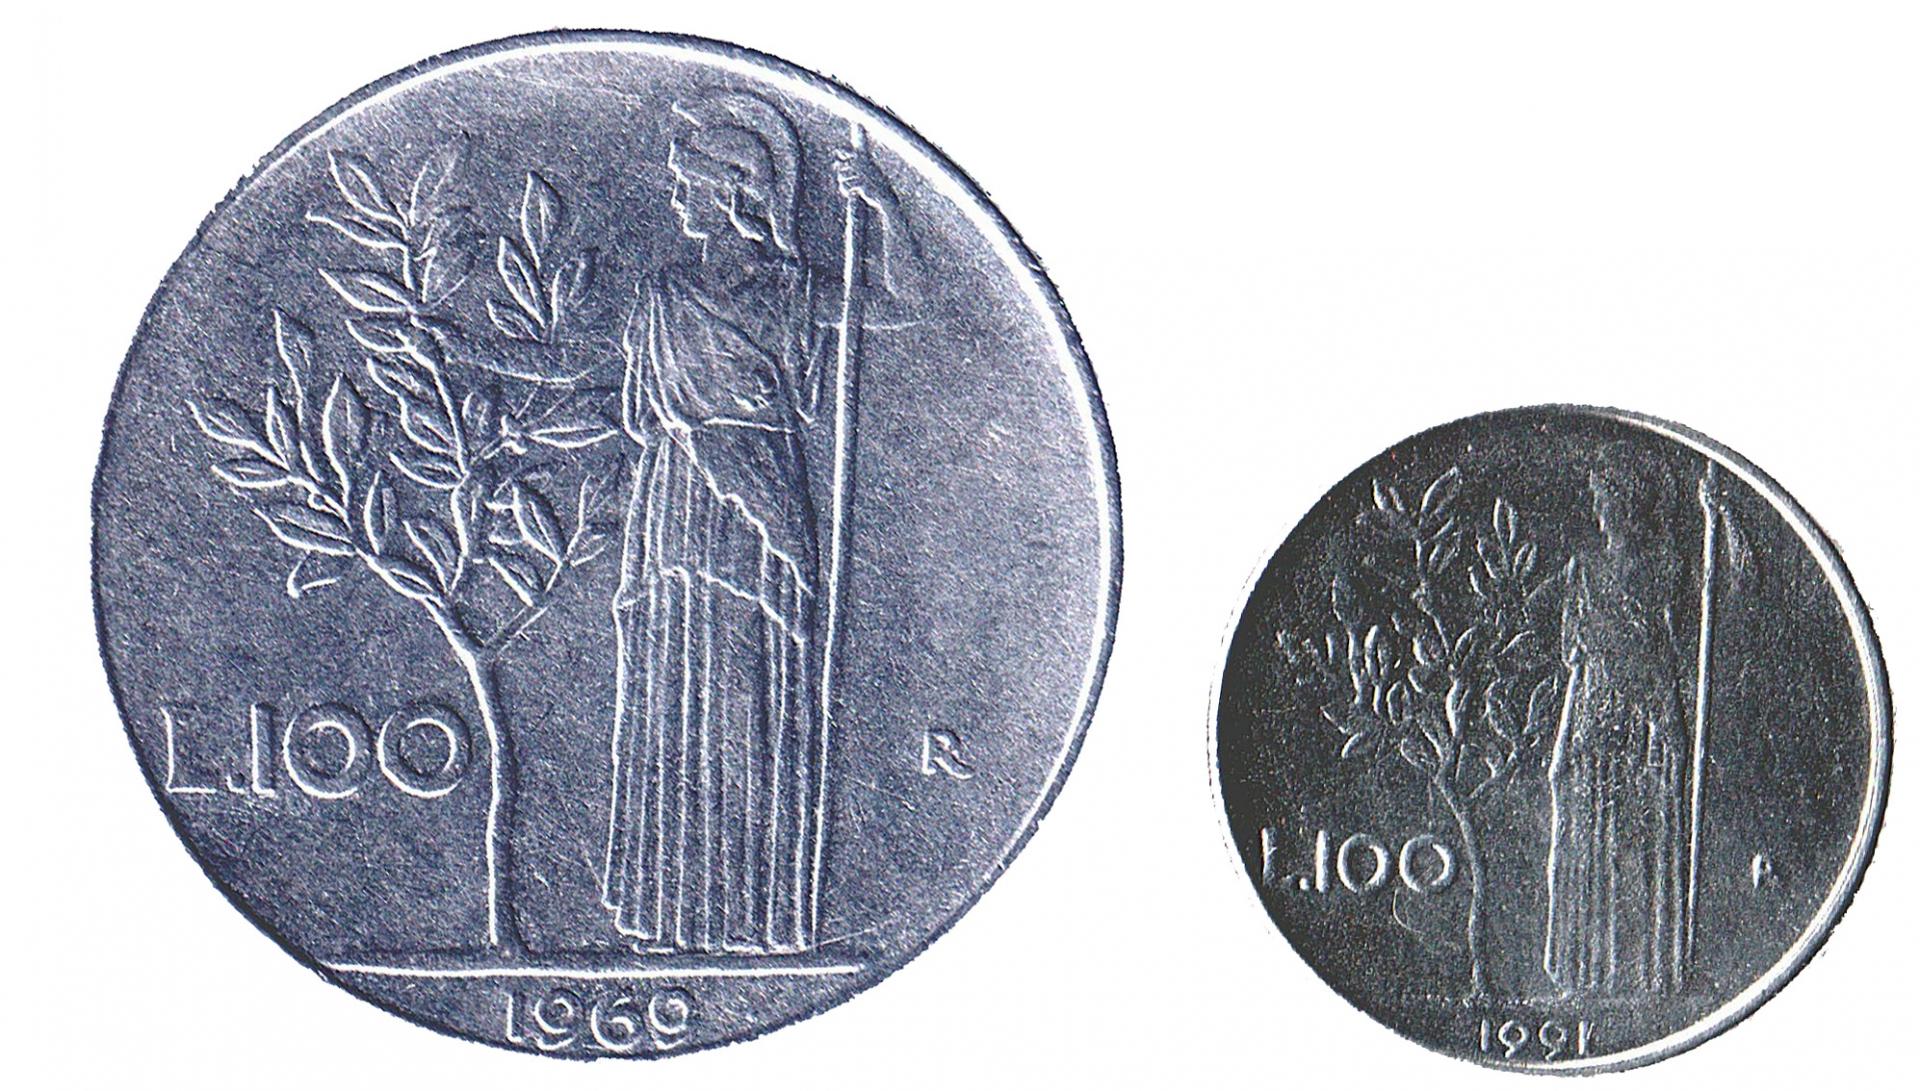 L'olivo moneta sonante